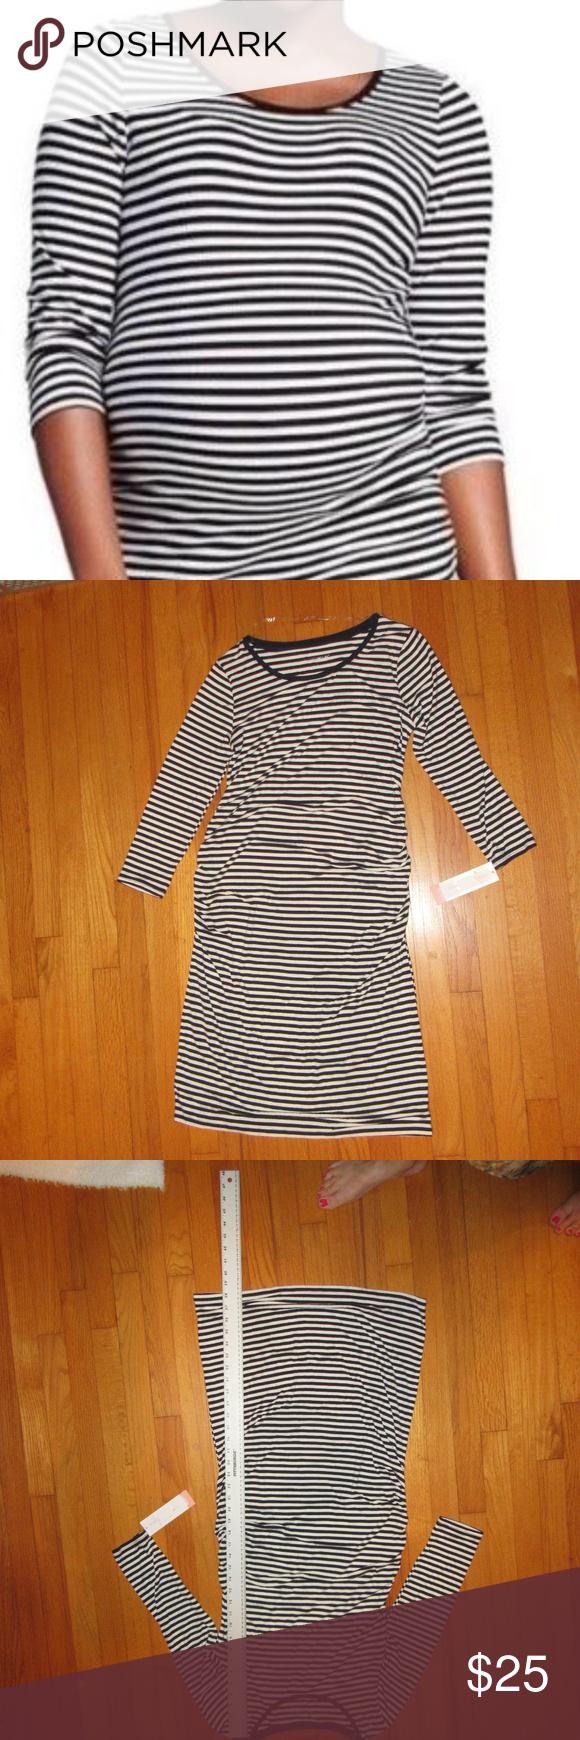 Nwt liz lange maternity dress sleeve nwt in my posh picks